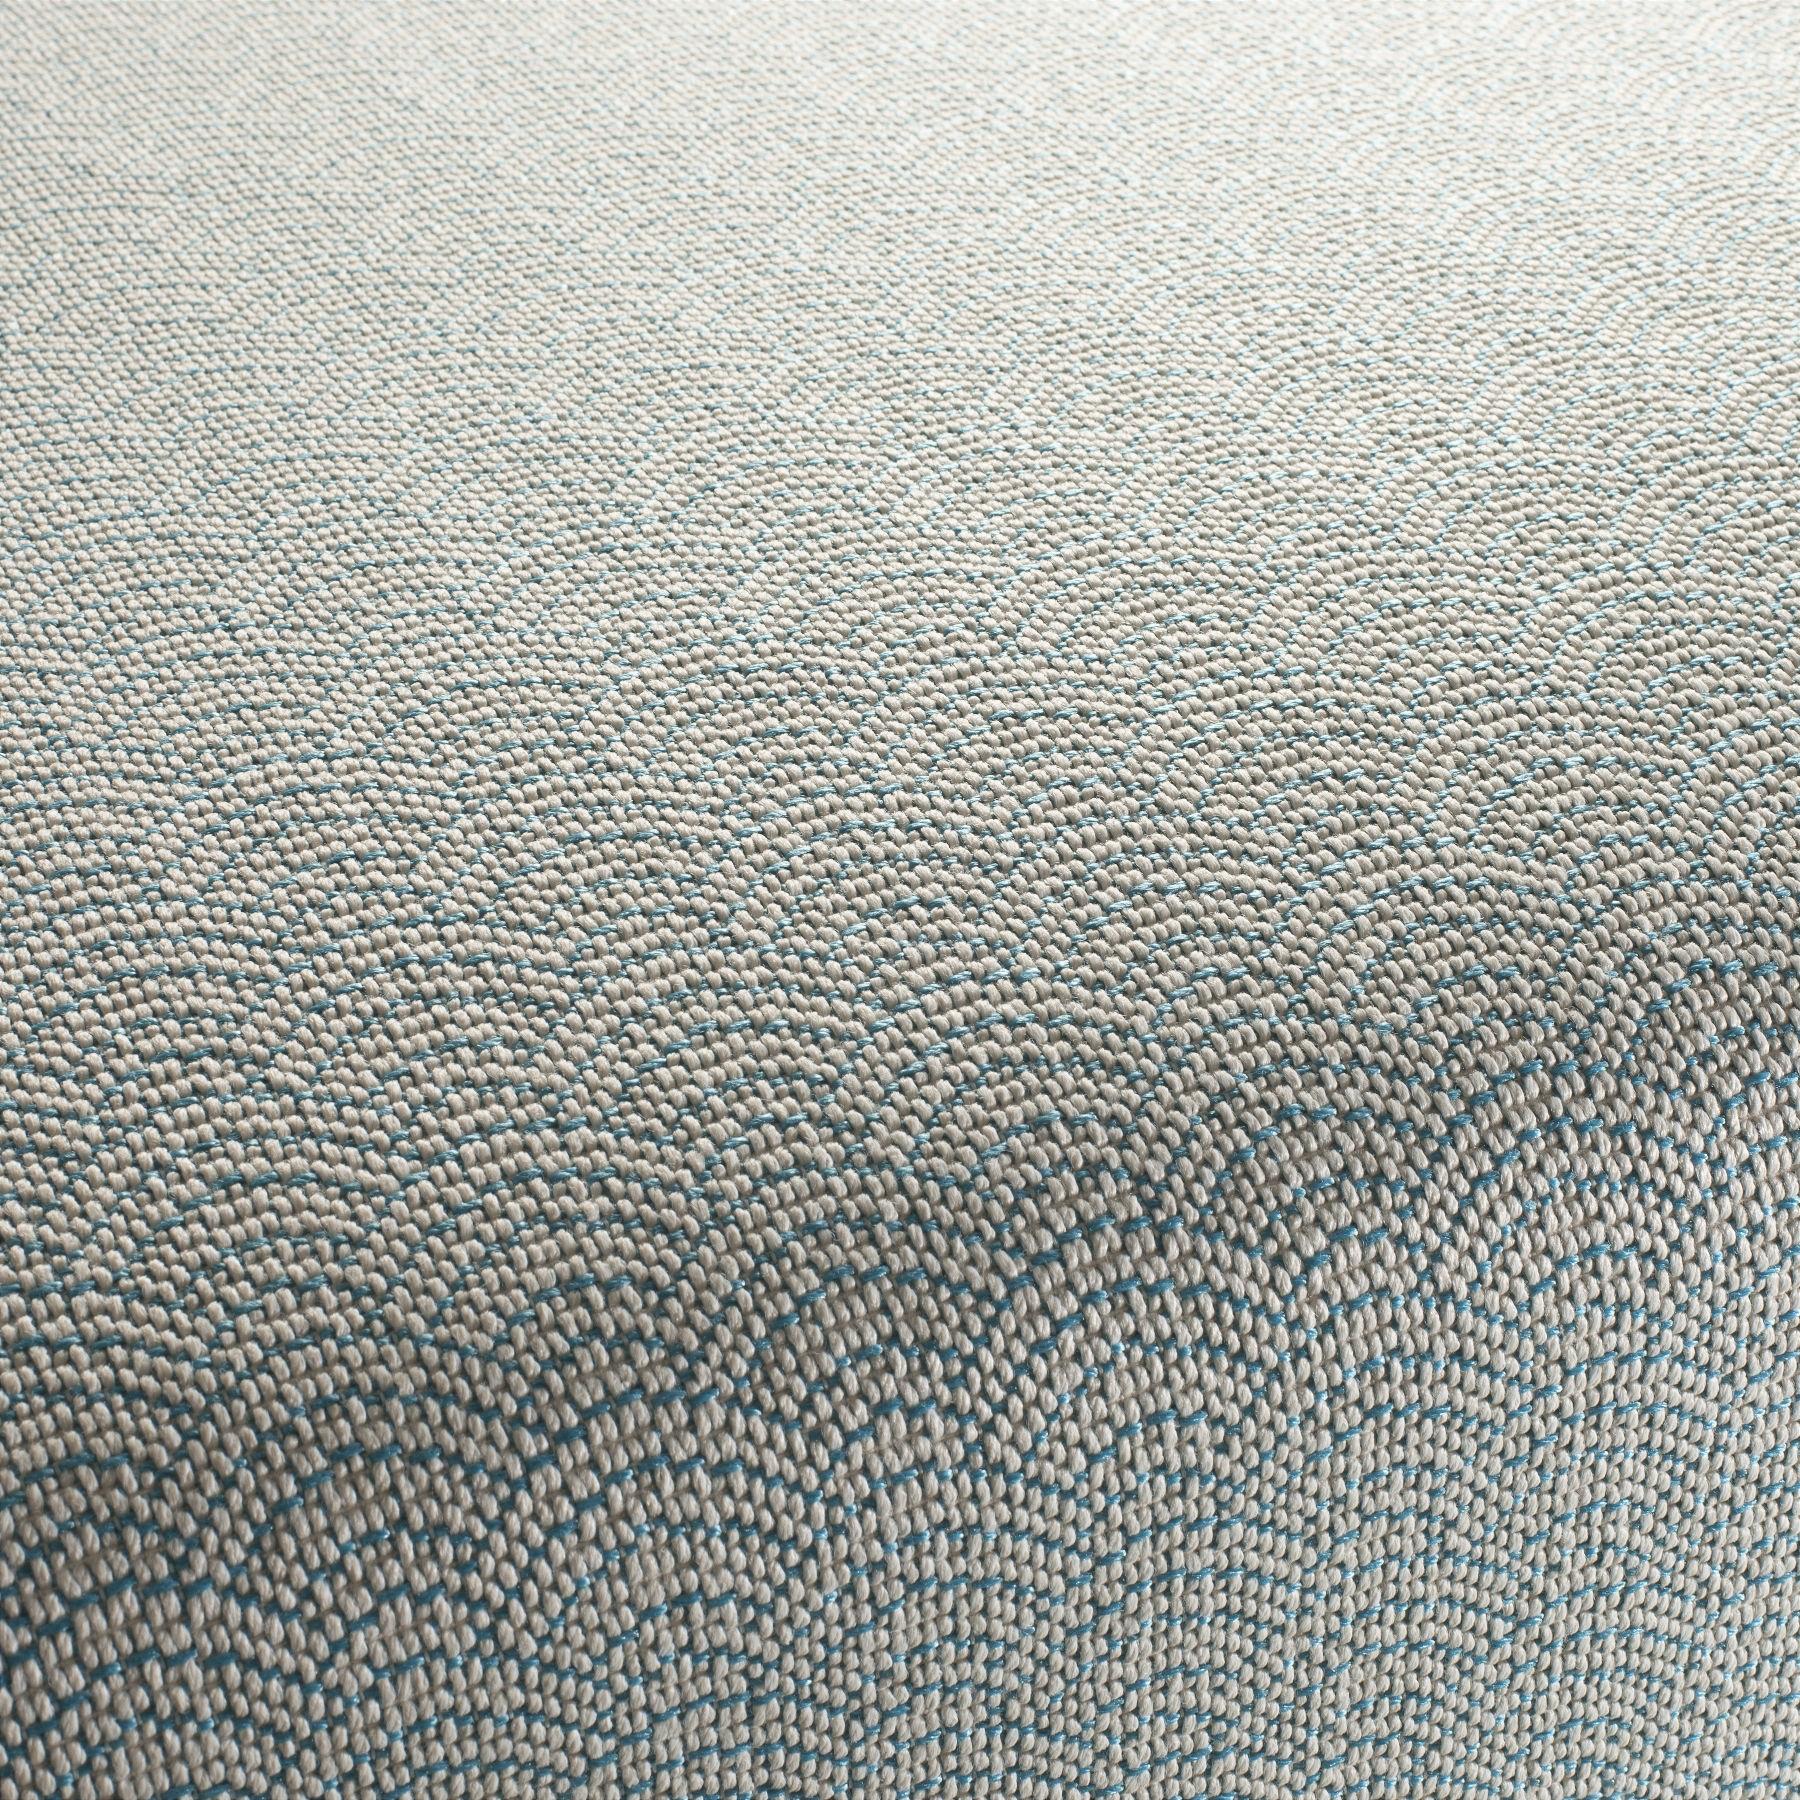 upholstery fabric malaga 9 2242 080 jab anstoetz fabrics. Black Bedroom Furniture Sets. Home Design Ideas